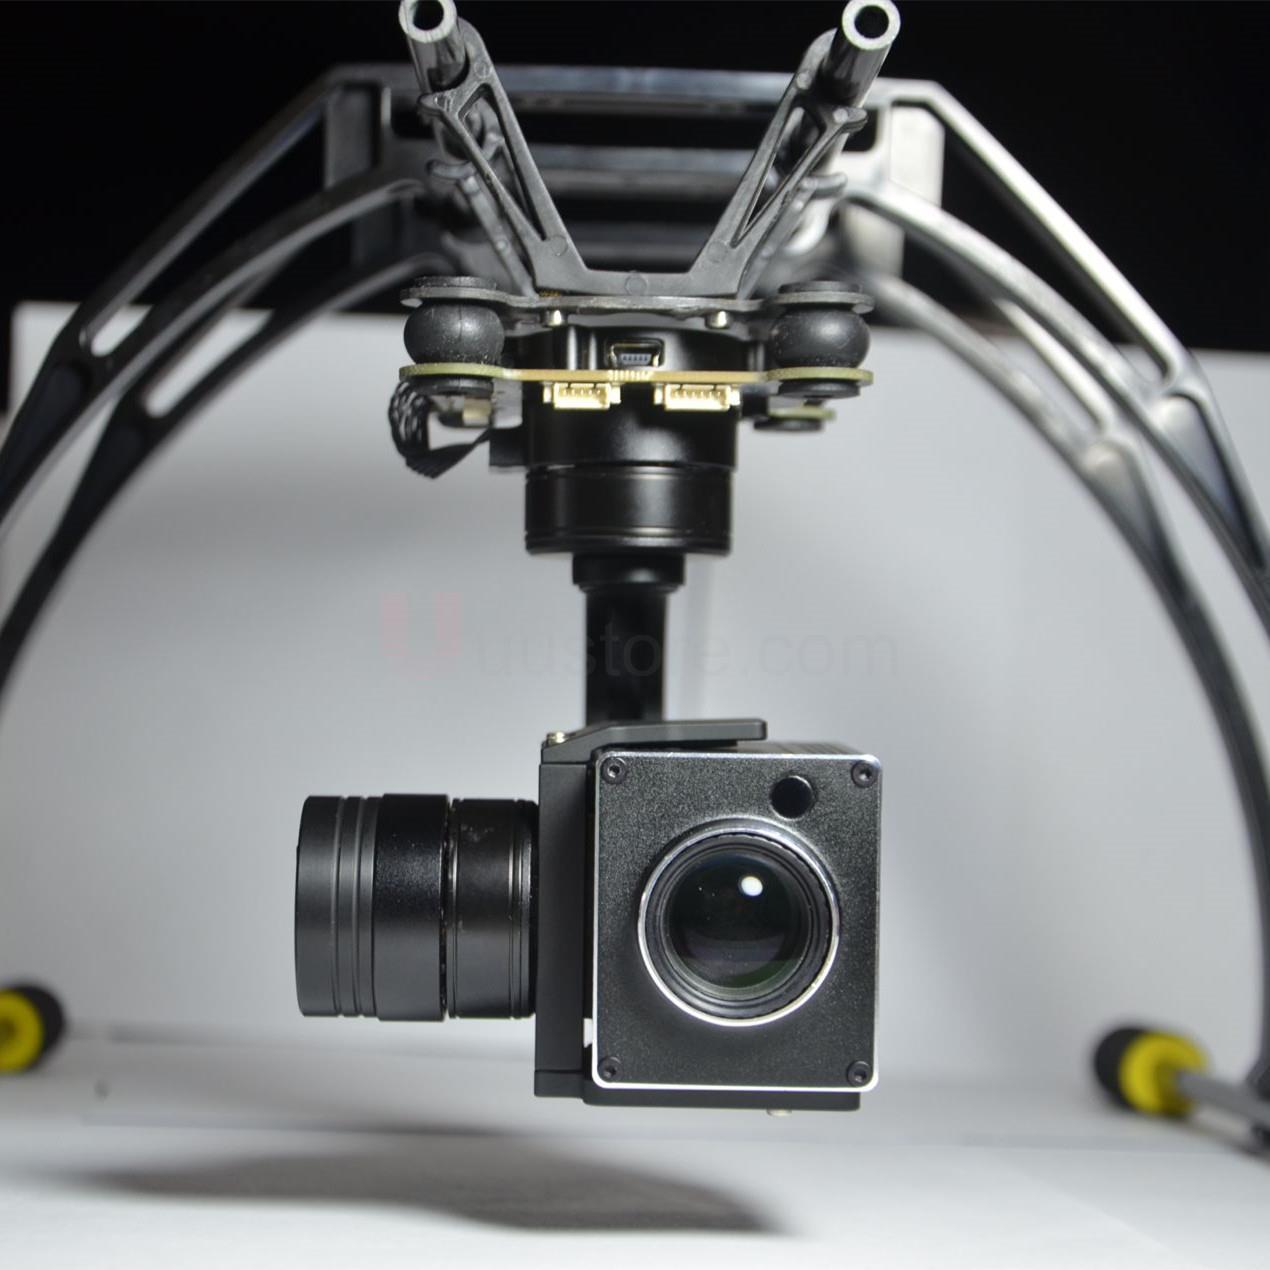 Pro 3-axis 18x Optical Zoom Aerial Camera SPECS 1080p Full HD Zoom Gimbal Long Distance Zoom удлинитель zoom ecm 3